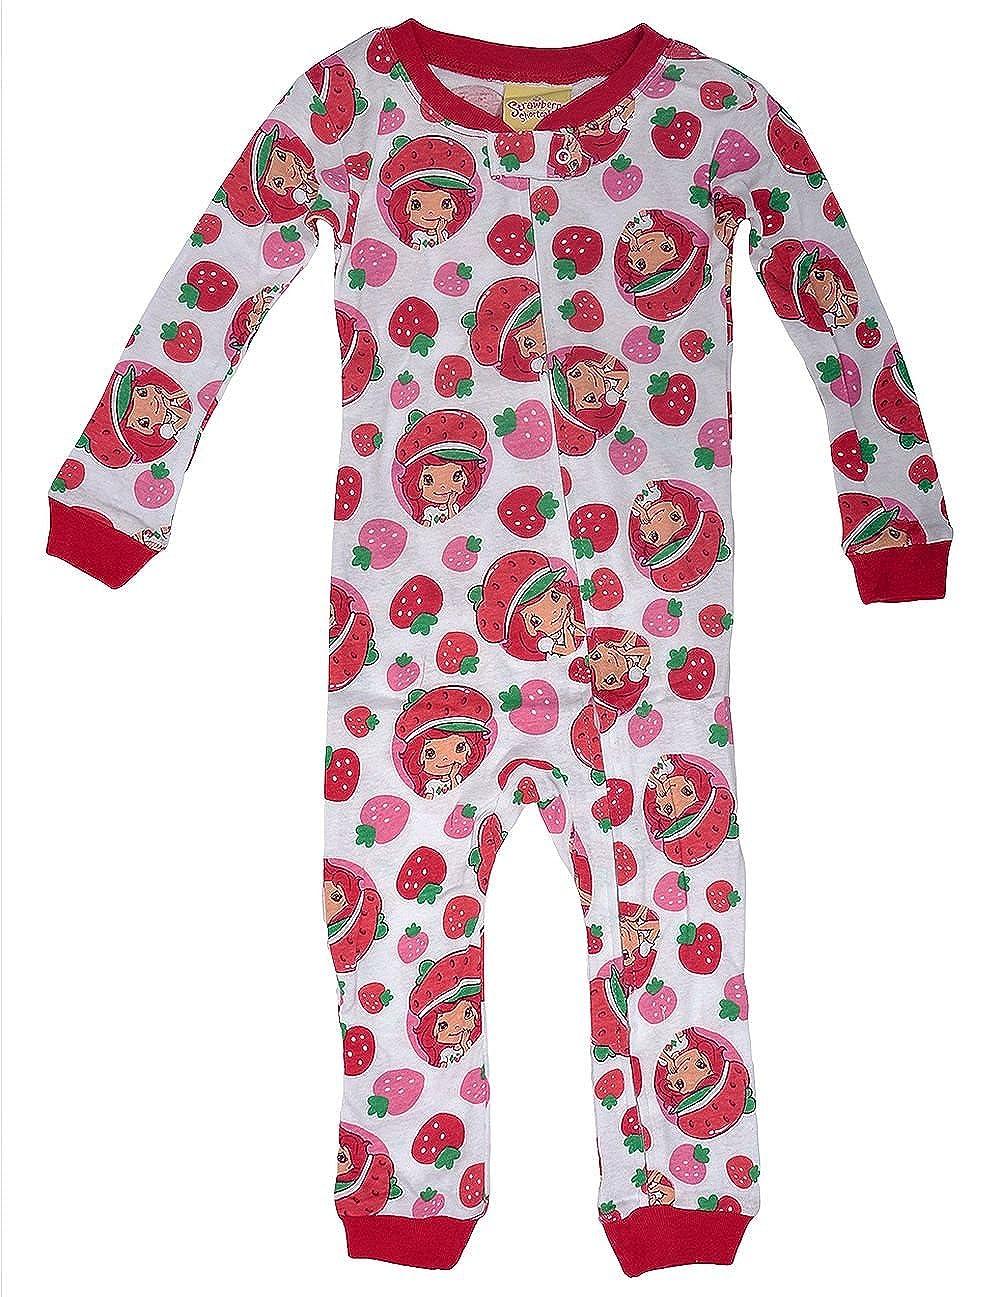 c112679f77 Amazon.com  AME Strawberry Shortcake Toddler Girl s Cotton Footless Pajama  Sleeper (4T)  Clothing